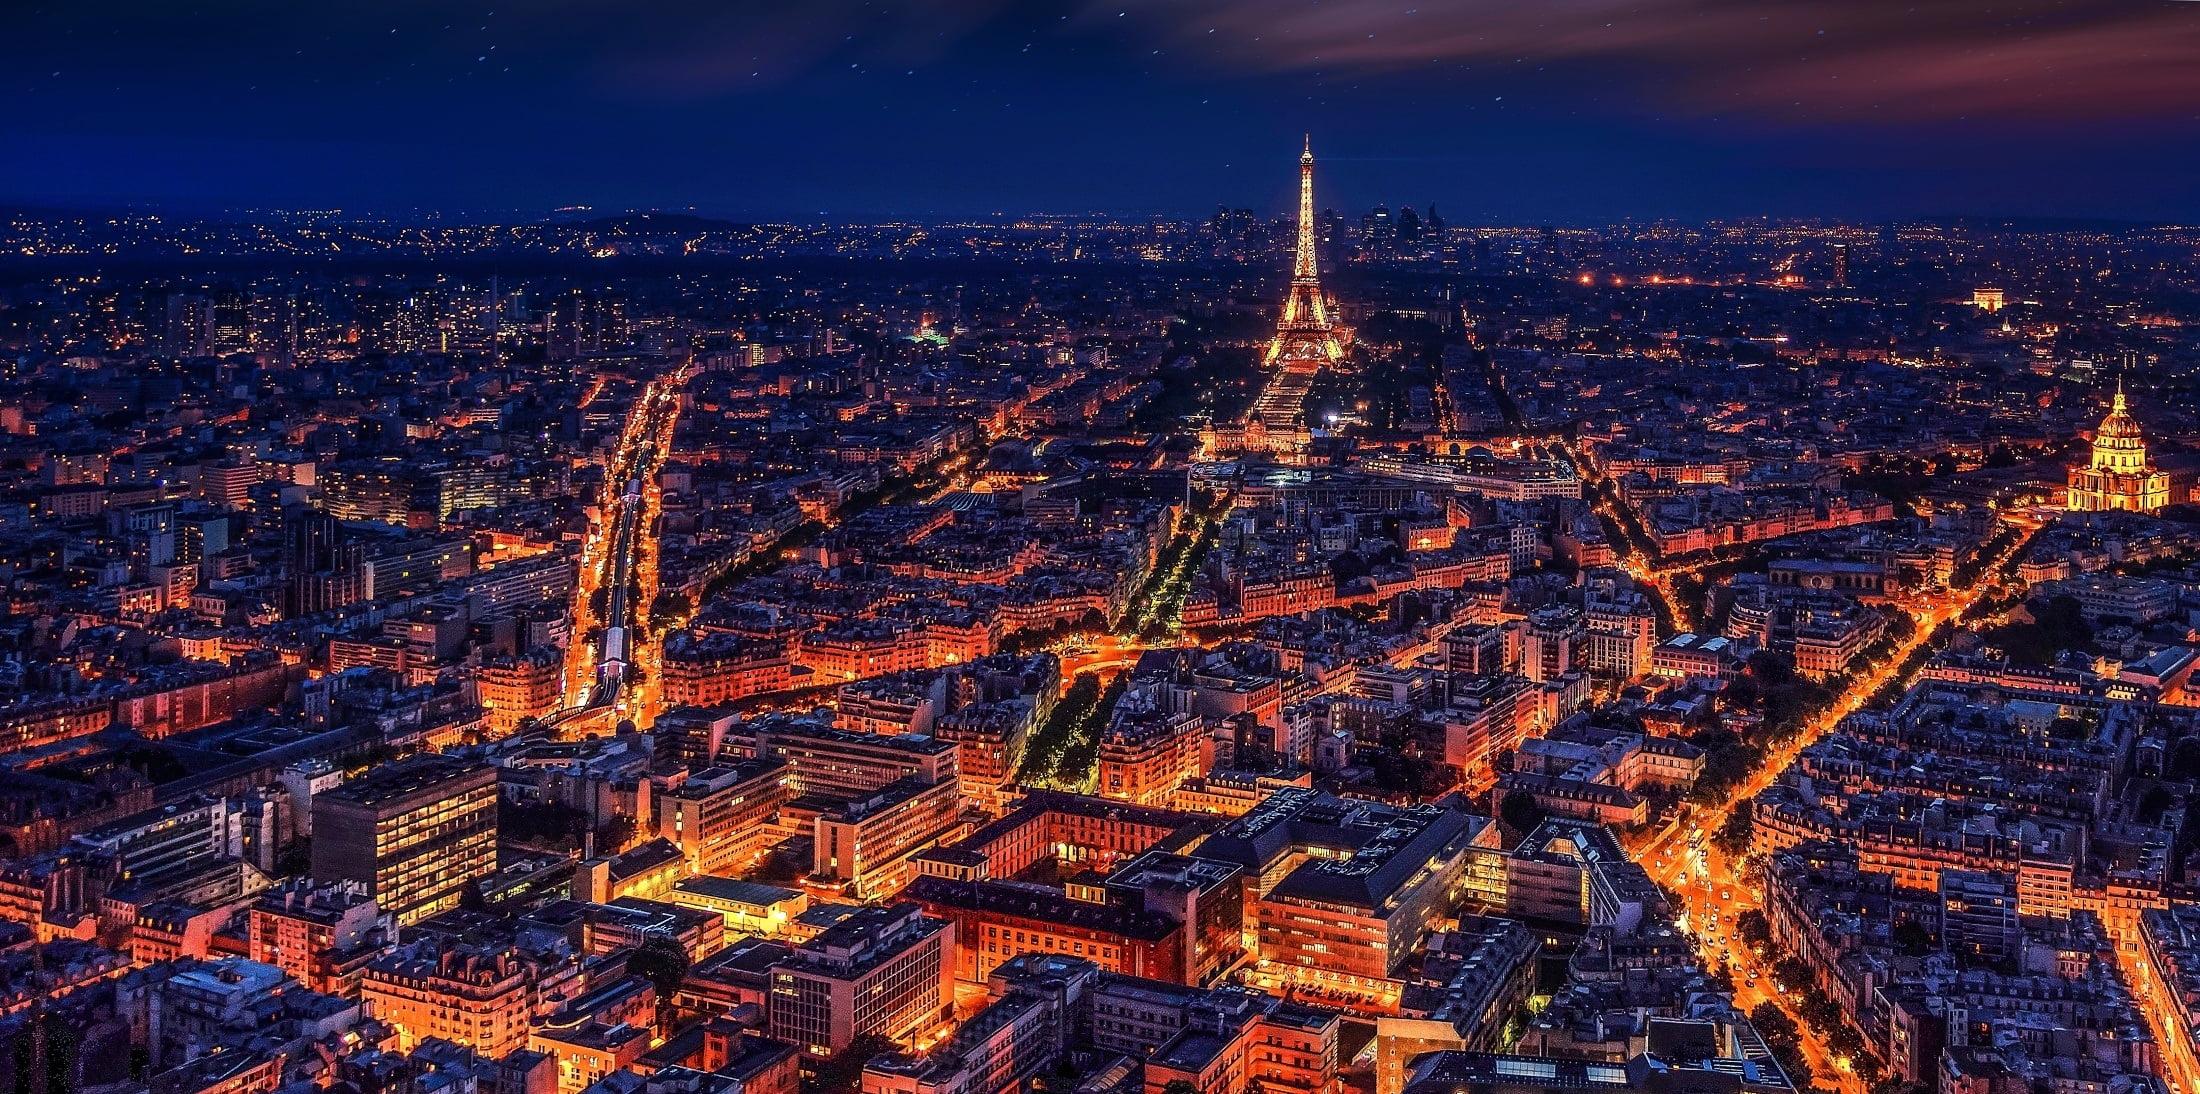 paris-france-eiffel-tower-night-wallpaper